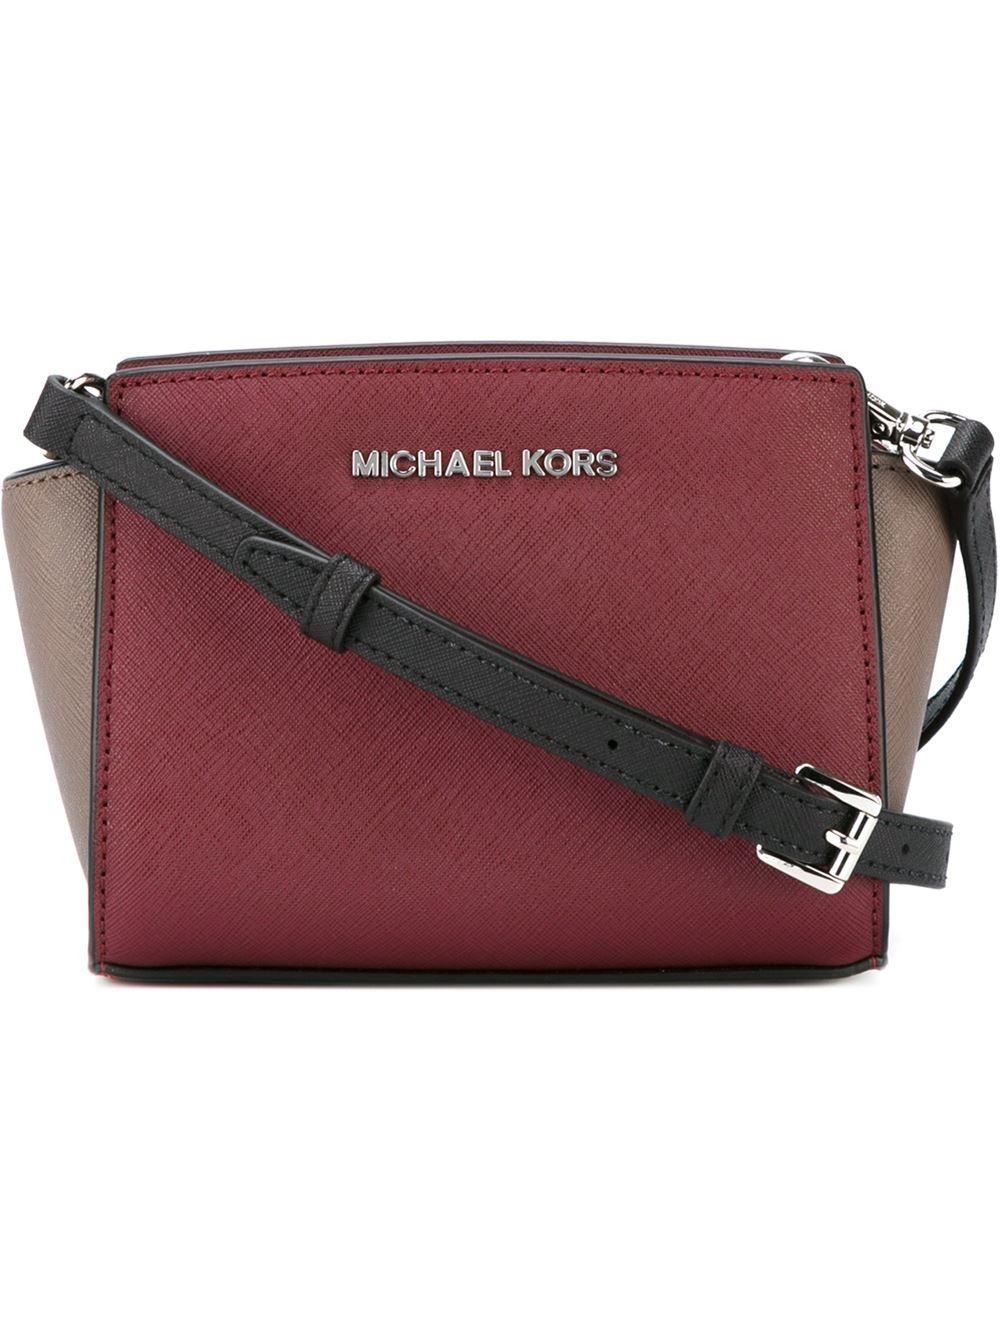 5057068e414cc ... coupon code for michael michael kors mini selma crossbody bag in purple  lyst 2d526 53497